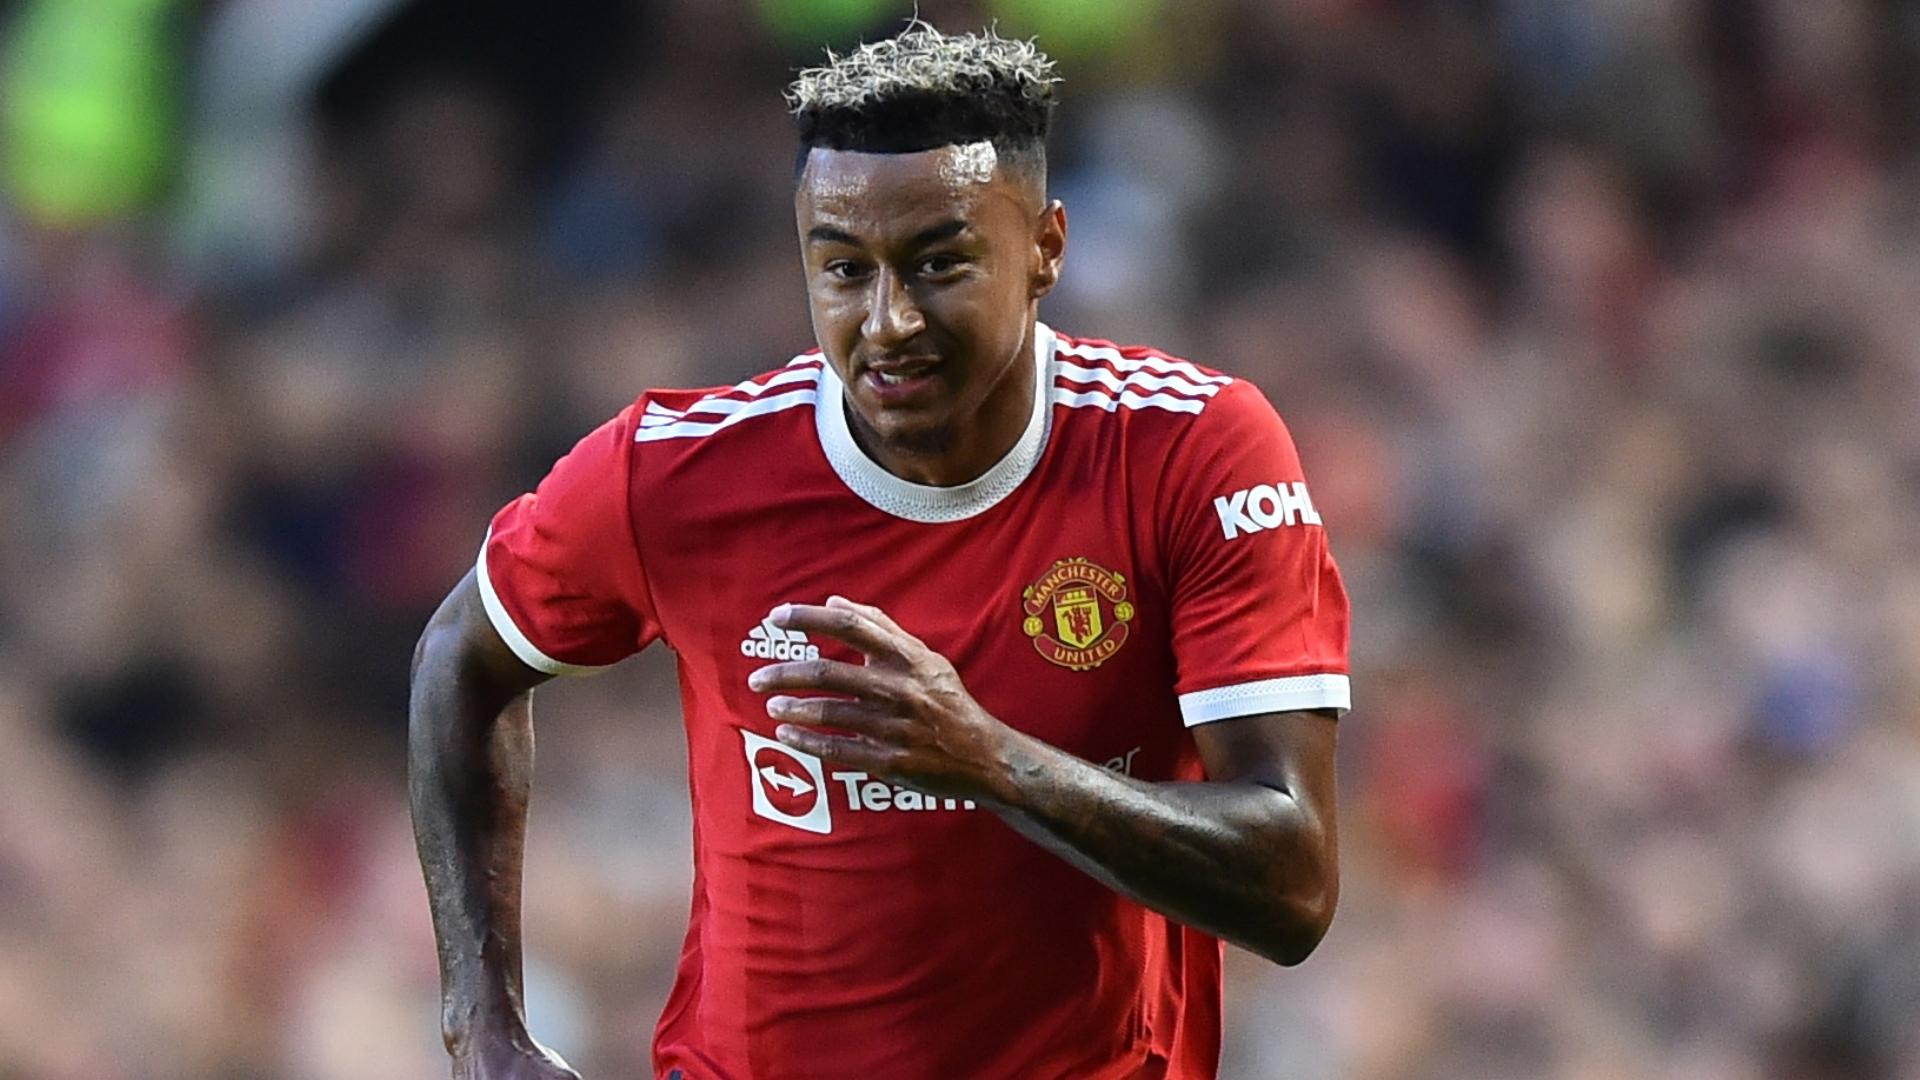 LIVE: Manchester United vs West Ham